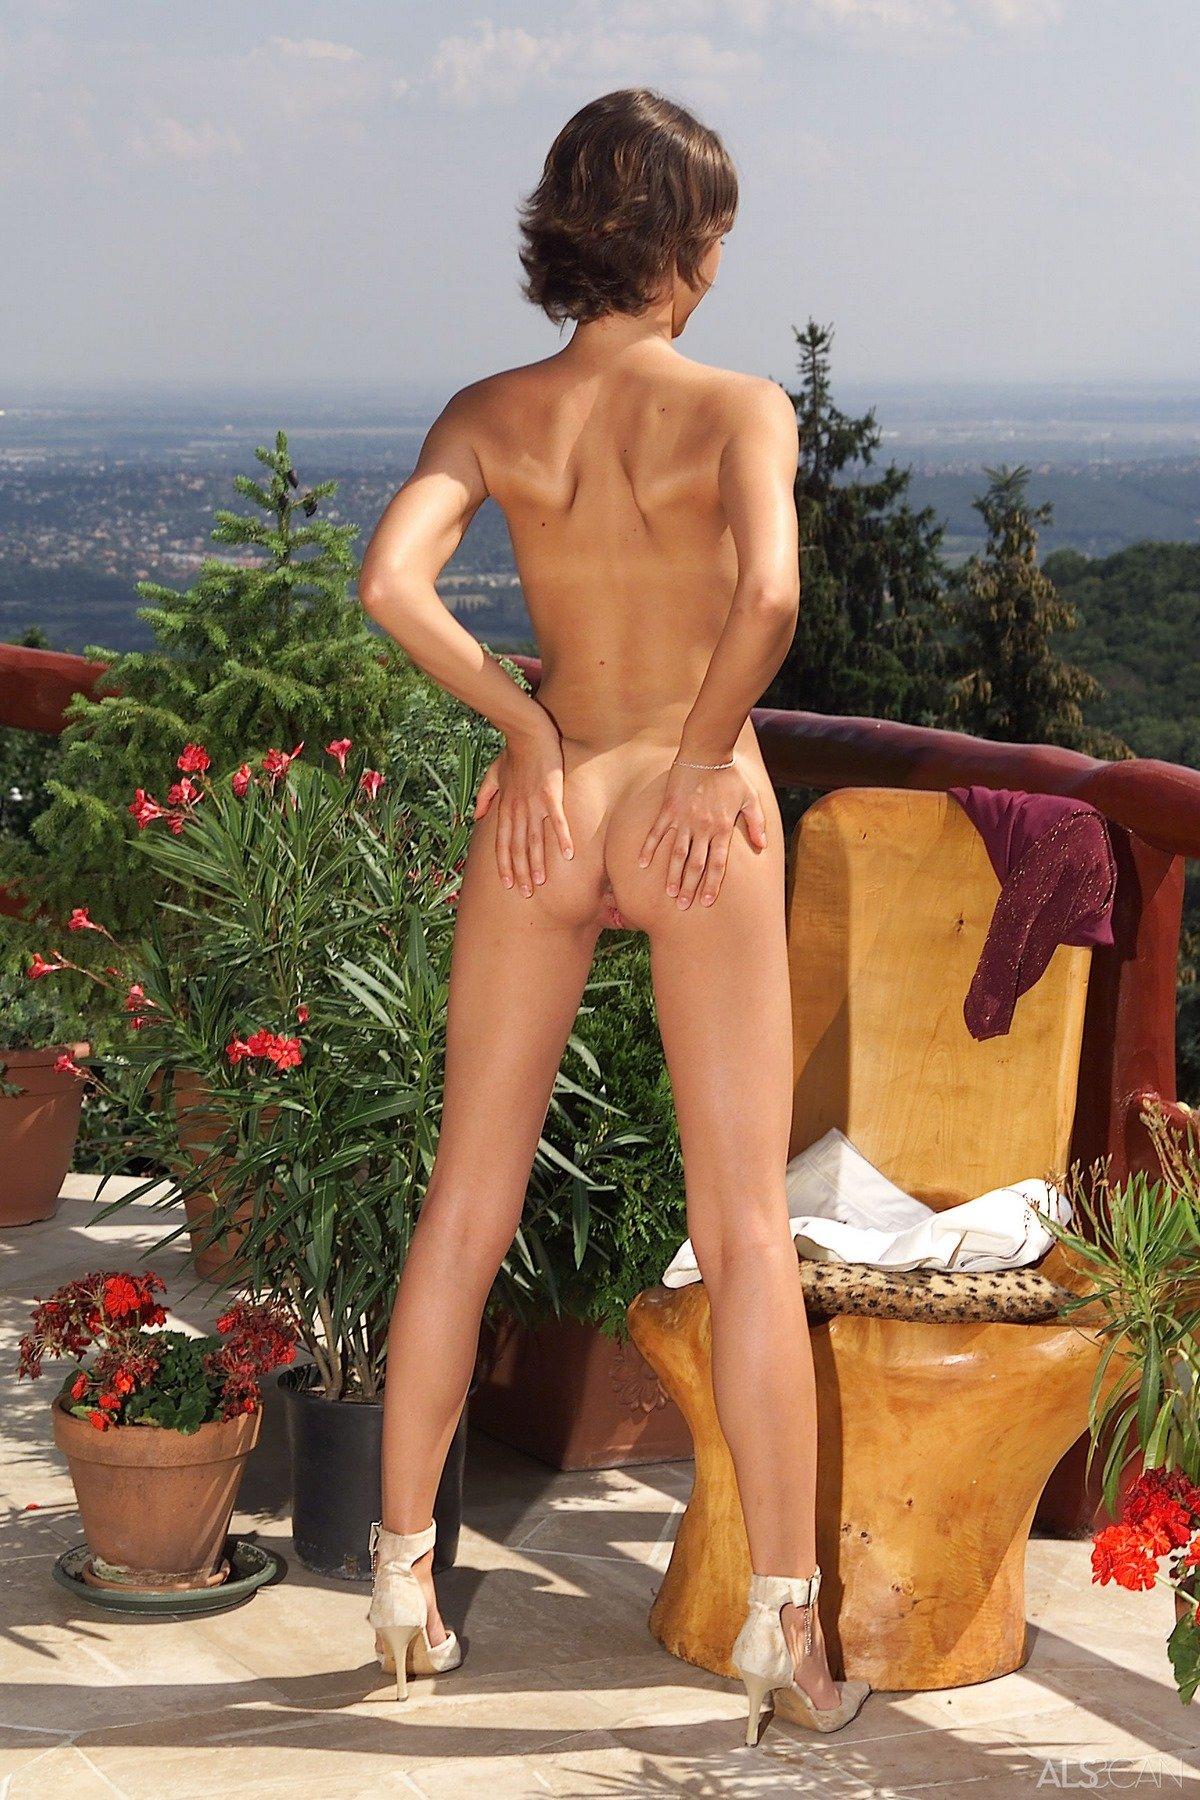 Симпатичная нагая баба с маленьким бюстом на балконе